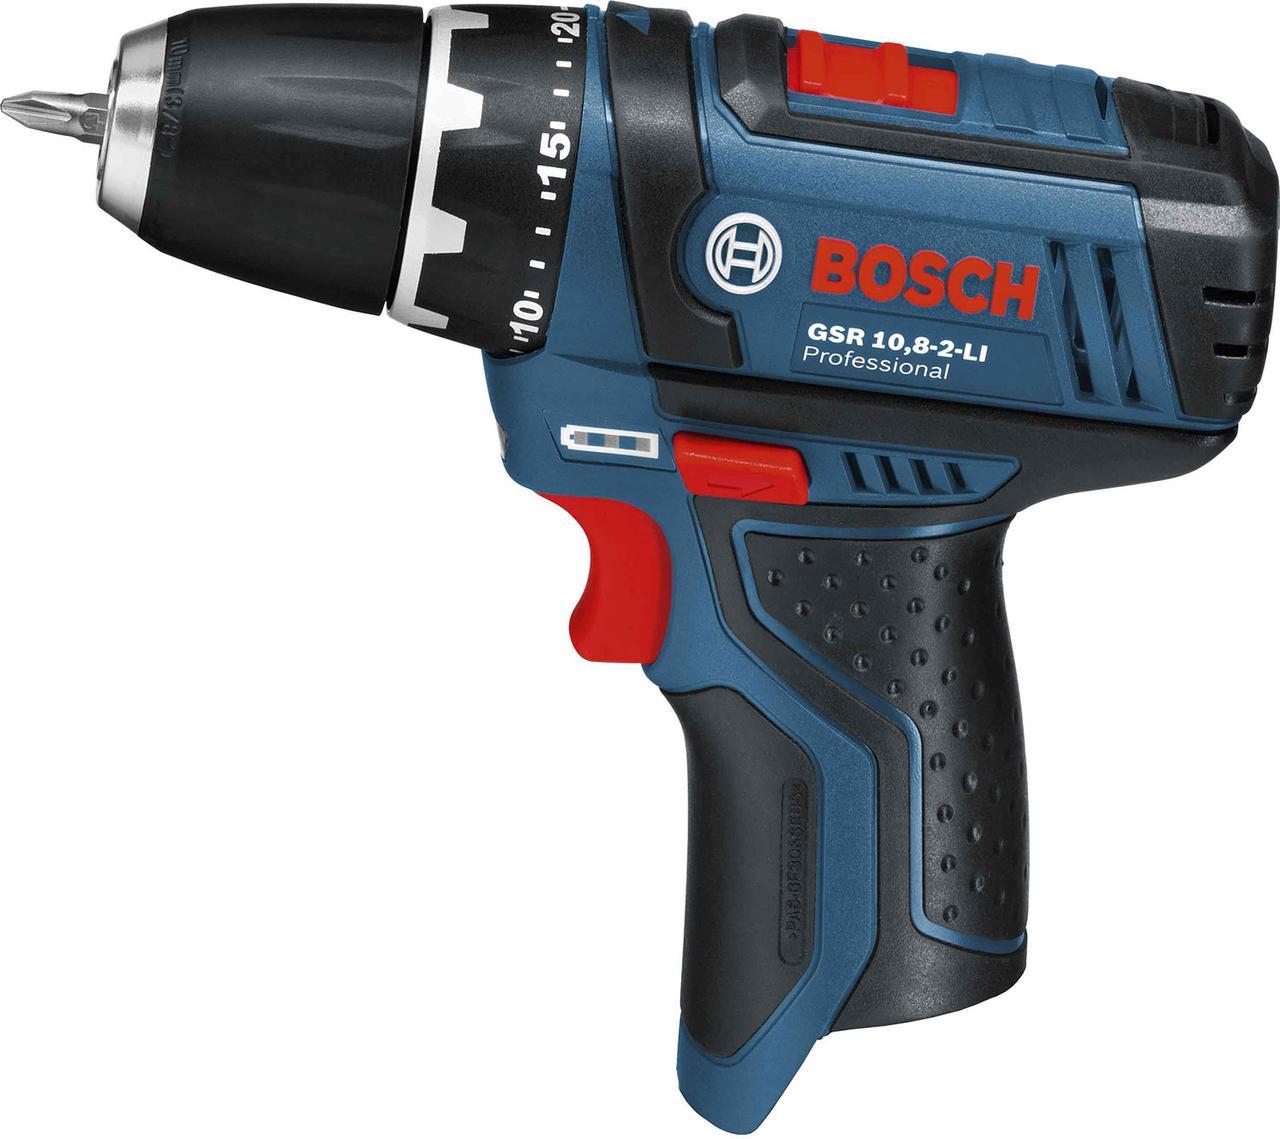 Дрель-шуруповерт Bosch GSR 10.8-2-LI Professional 0601868101